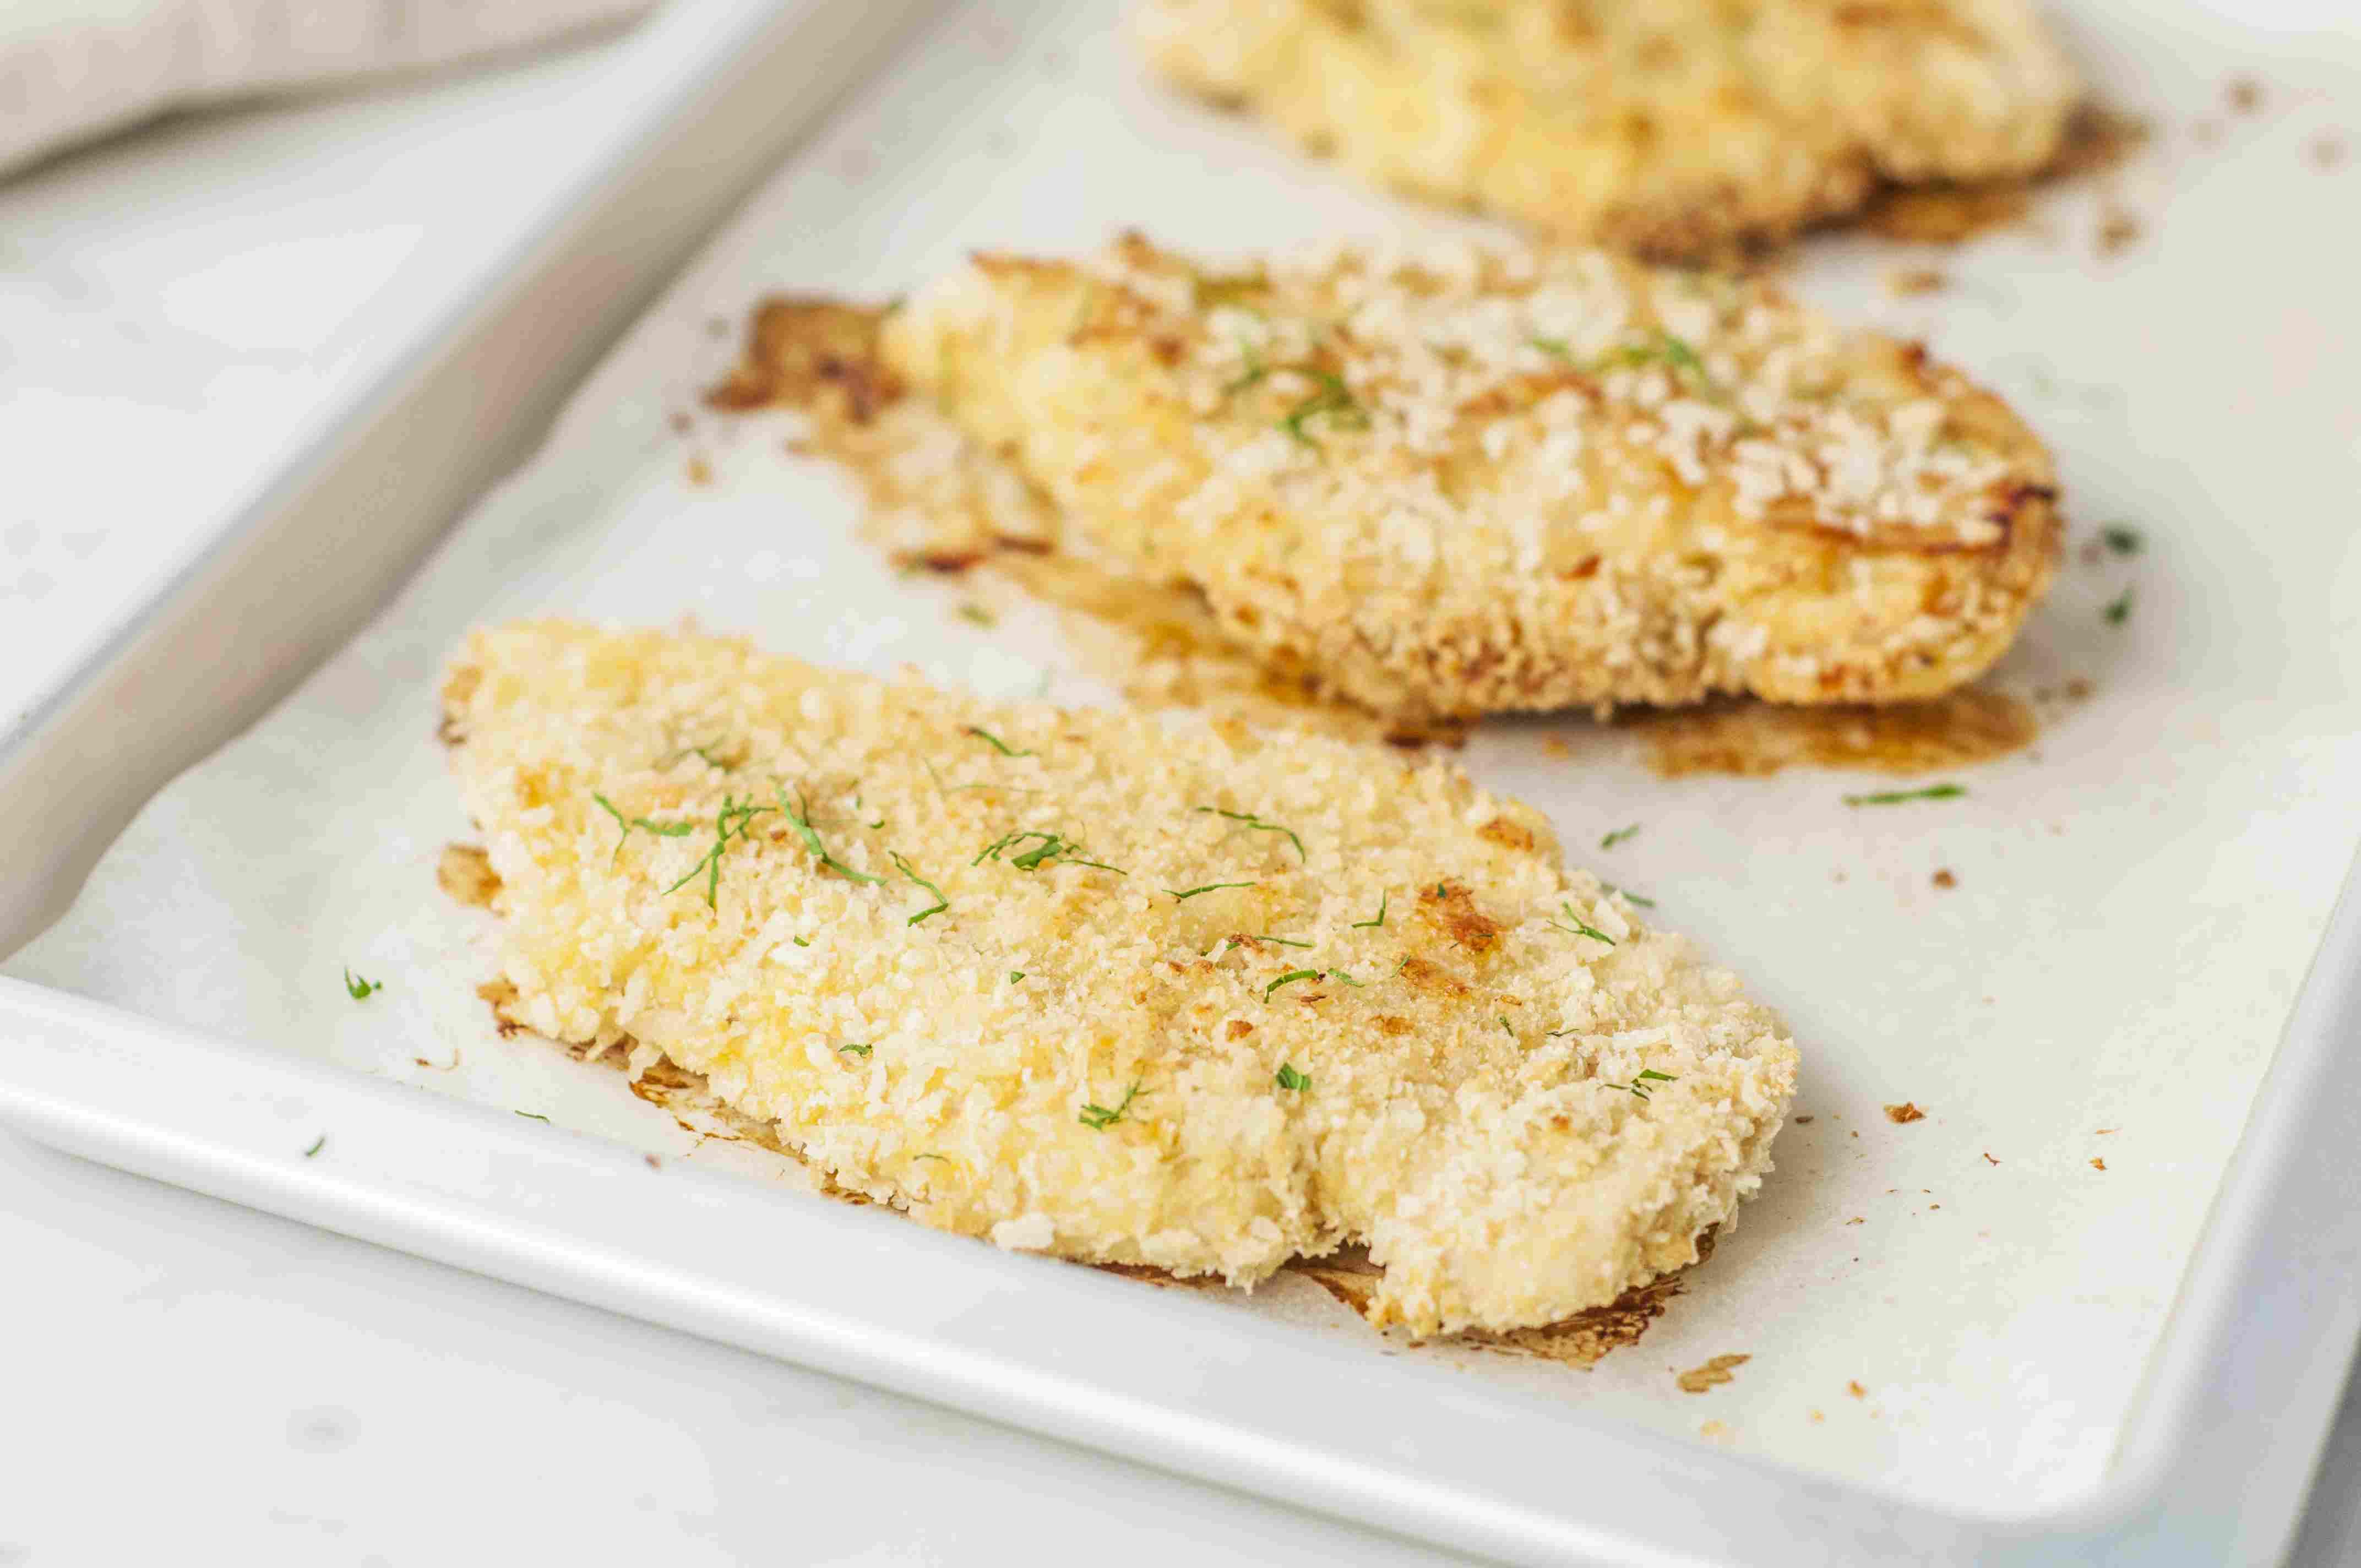 Baked breaded chicken breasts